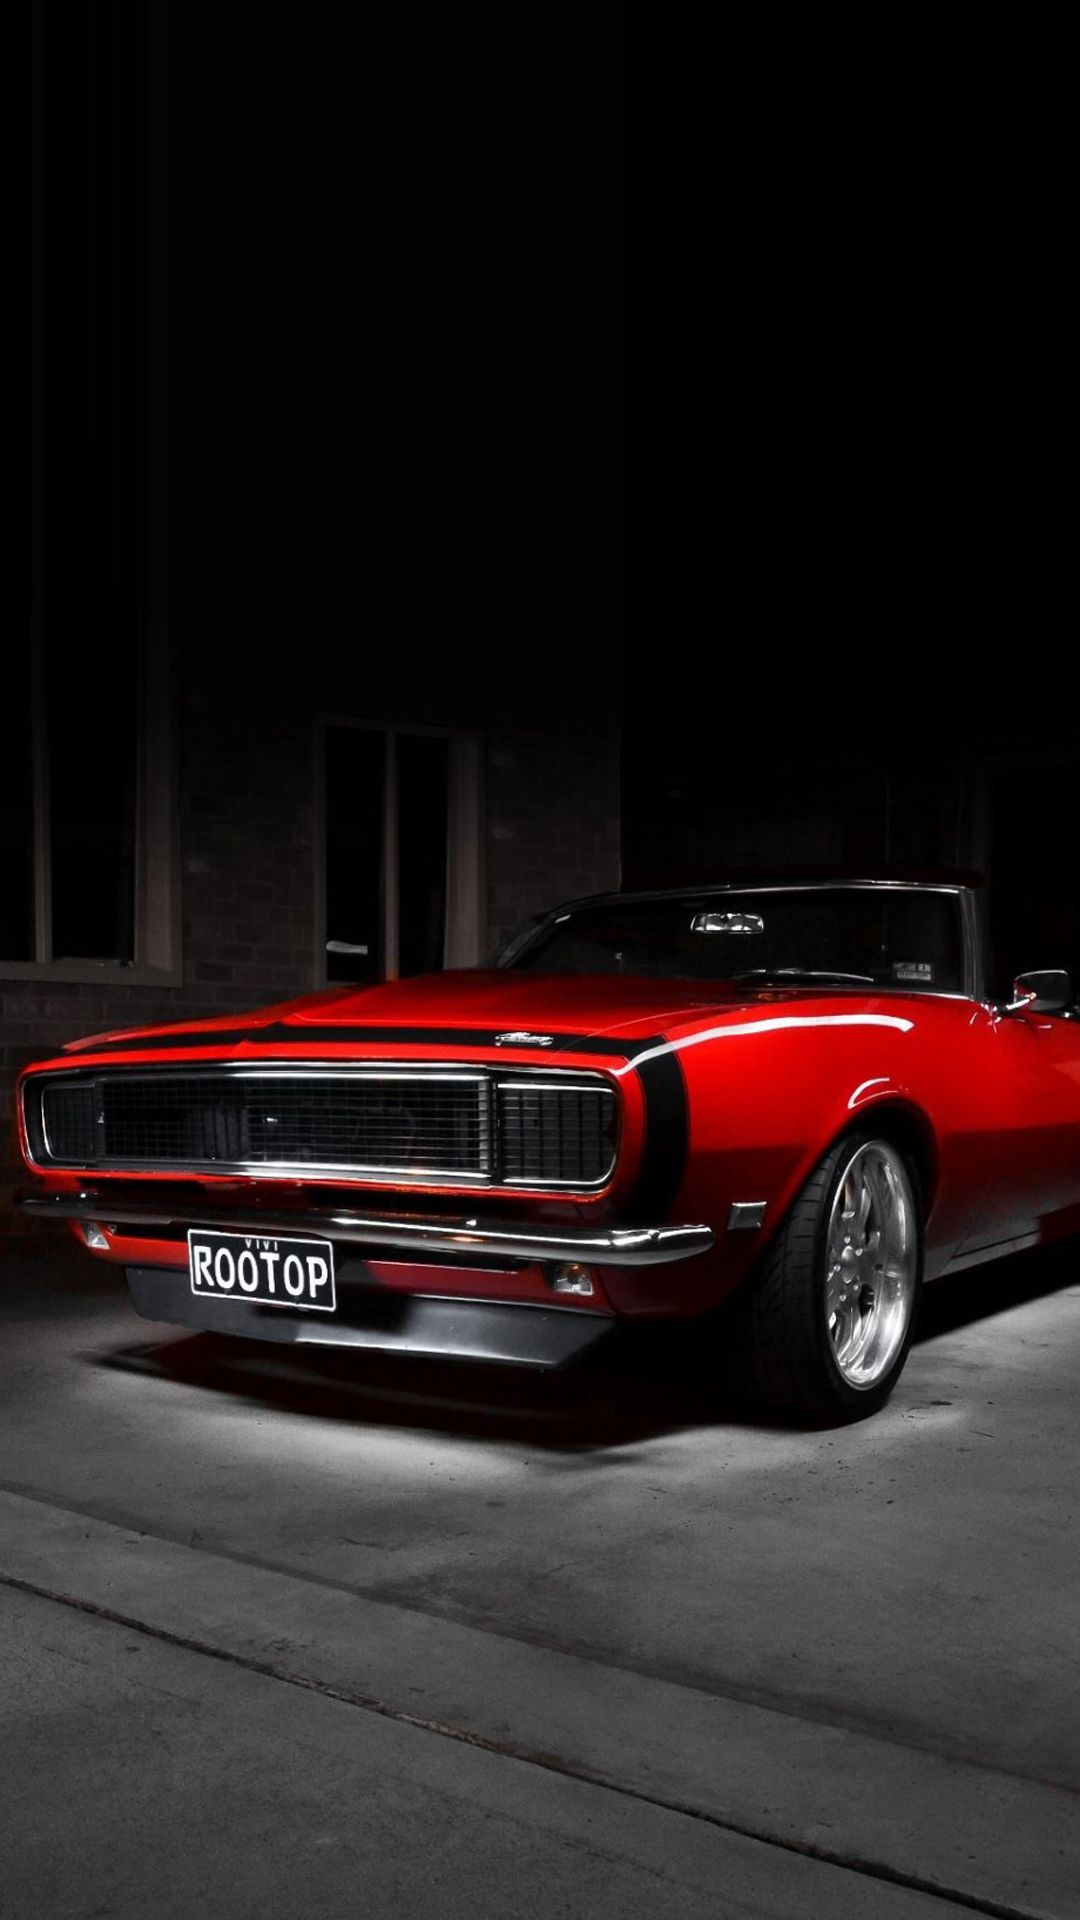 Phone Wallpaper Hd Futuristic Cars Top Luxury Cars Muscle Cars